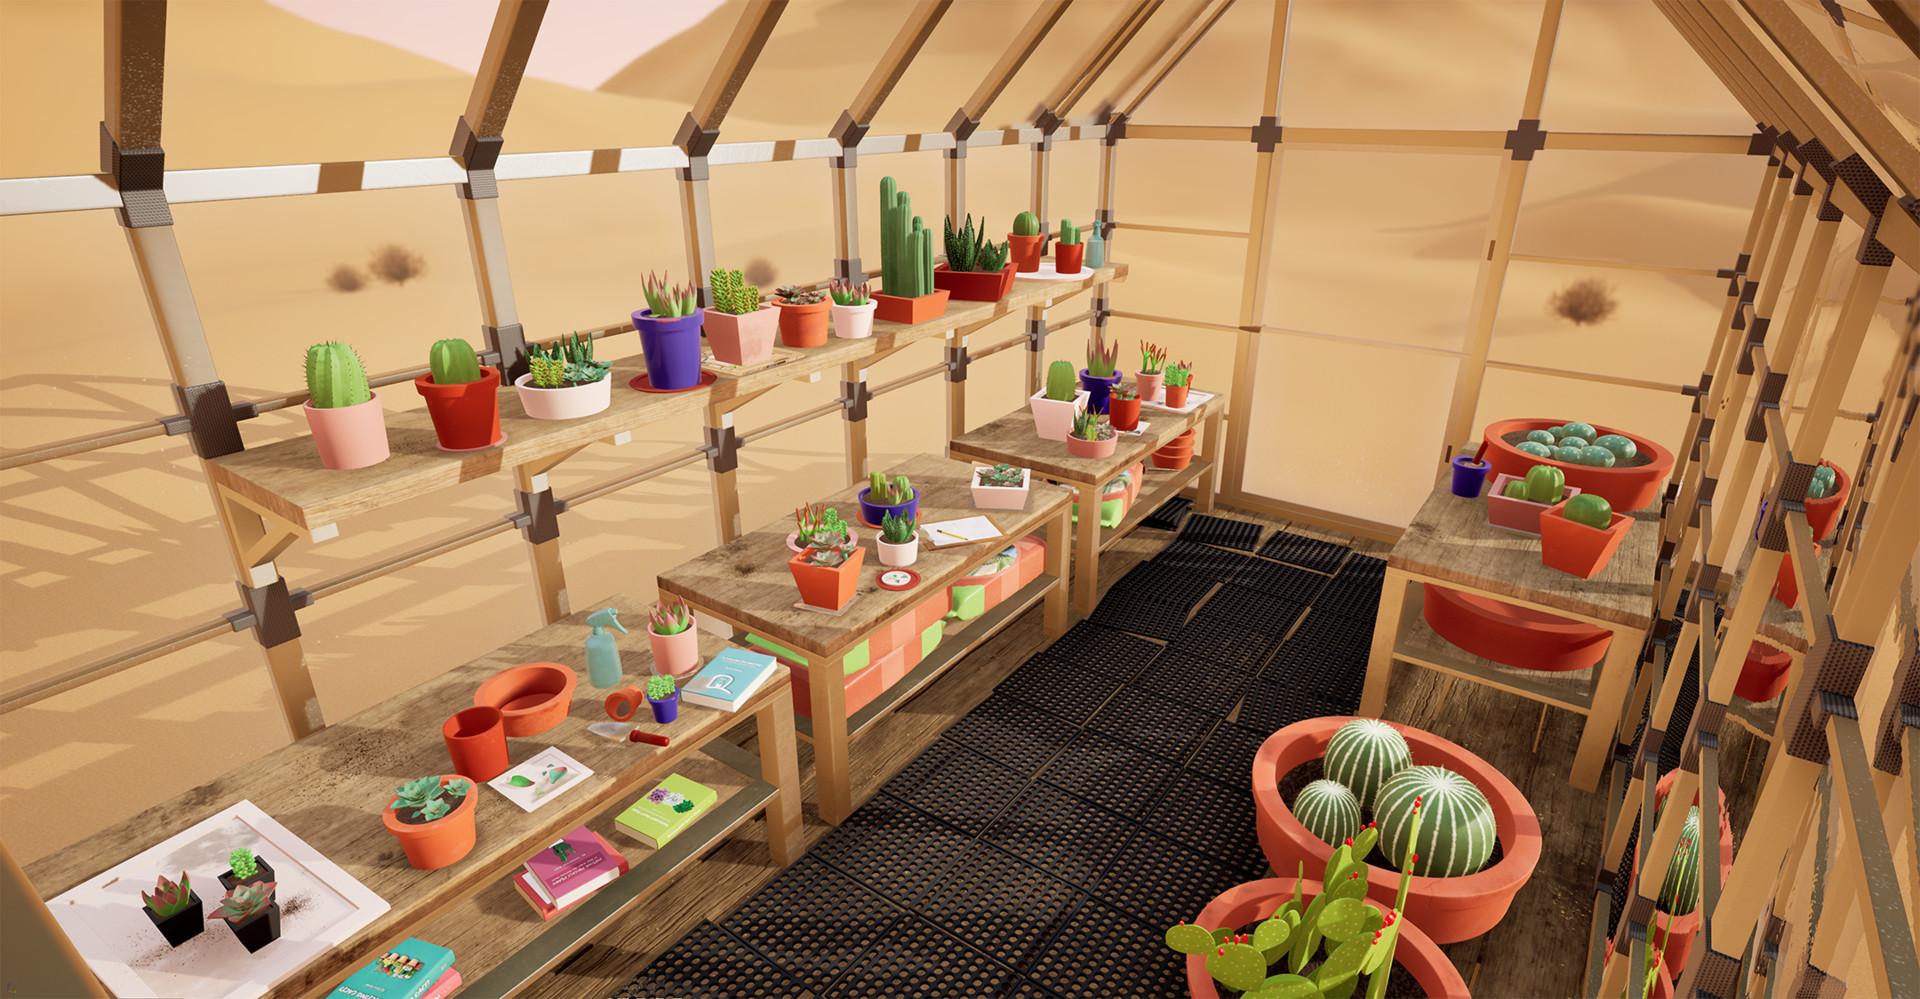 Miraculous Artstation Desert Greenhouse Shannon Ramirez Home Interior And Landscaping Oversignezvosmurscom